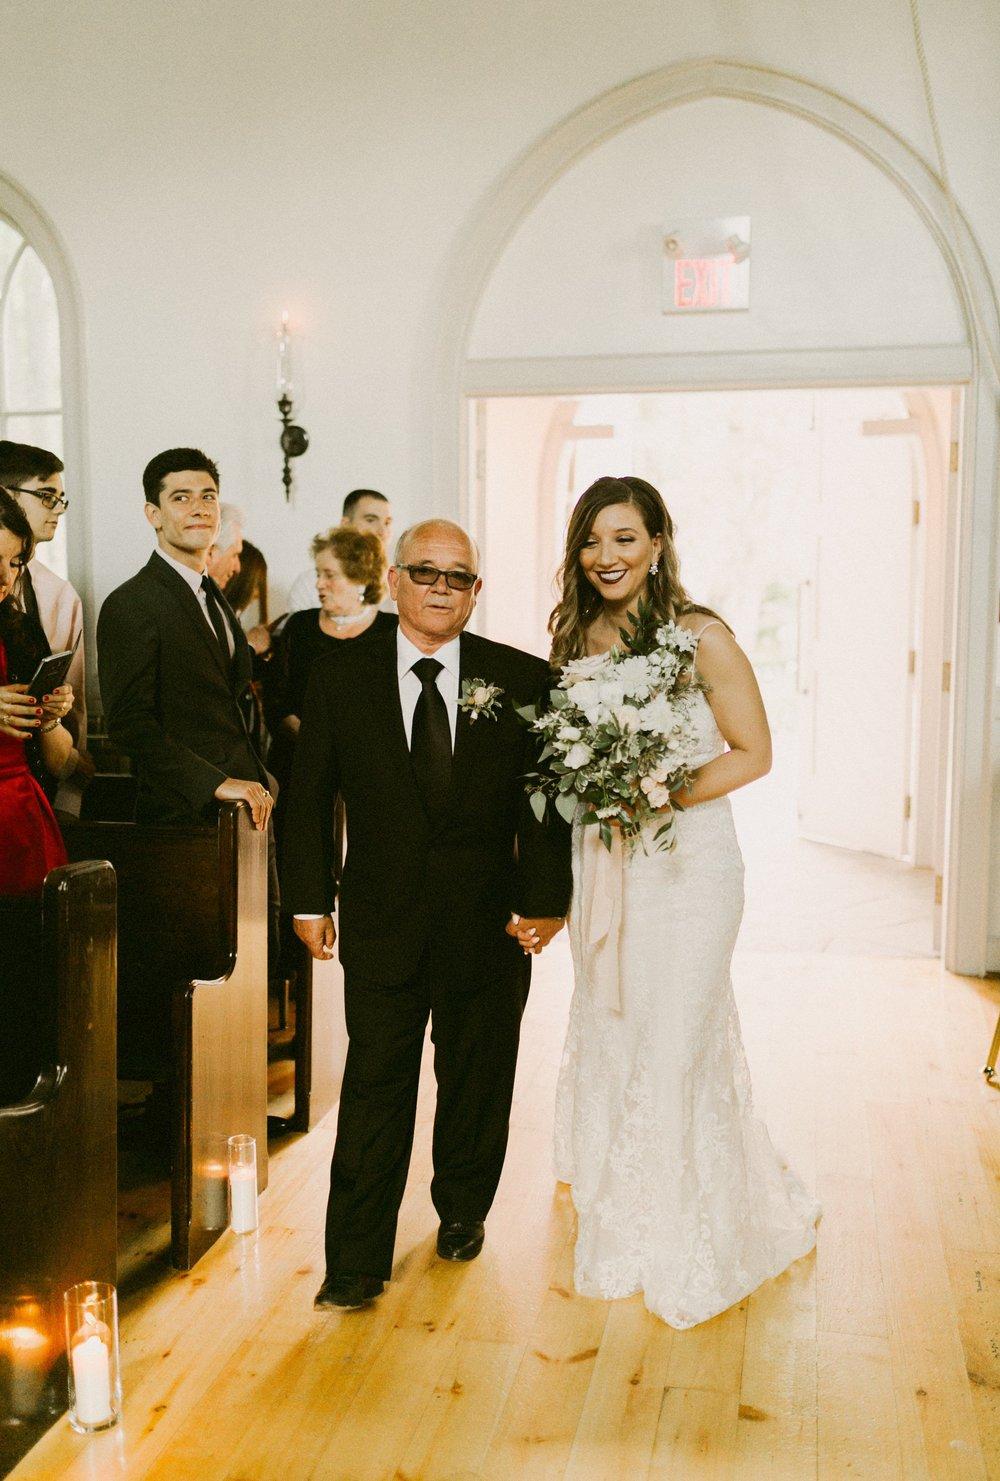 DanielaKamal_WEDDING_DOCTORSHOUSE_bisouseventsYAS-221ASE.jpg